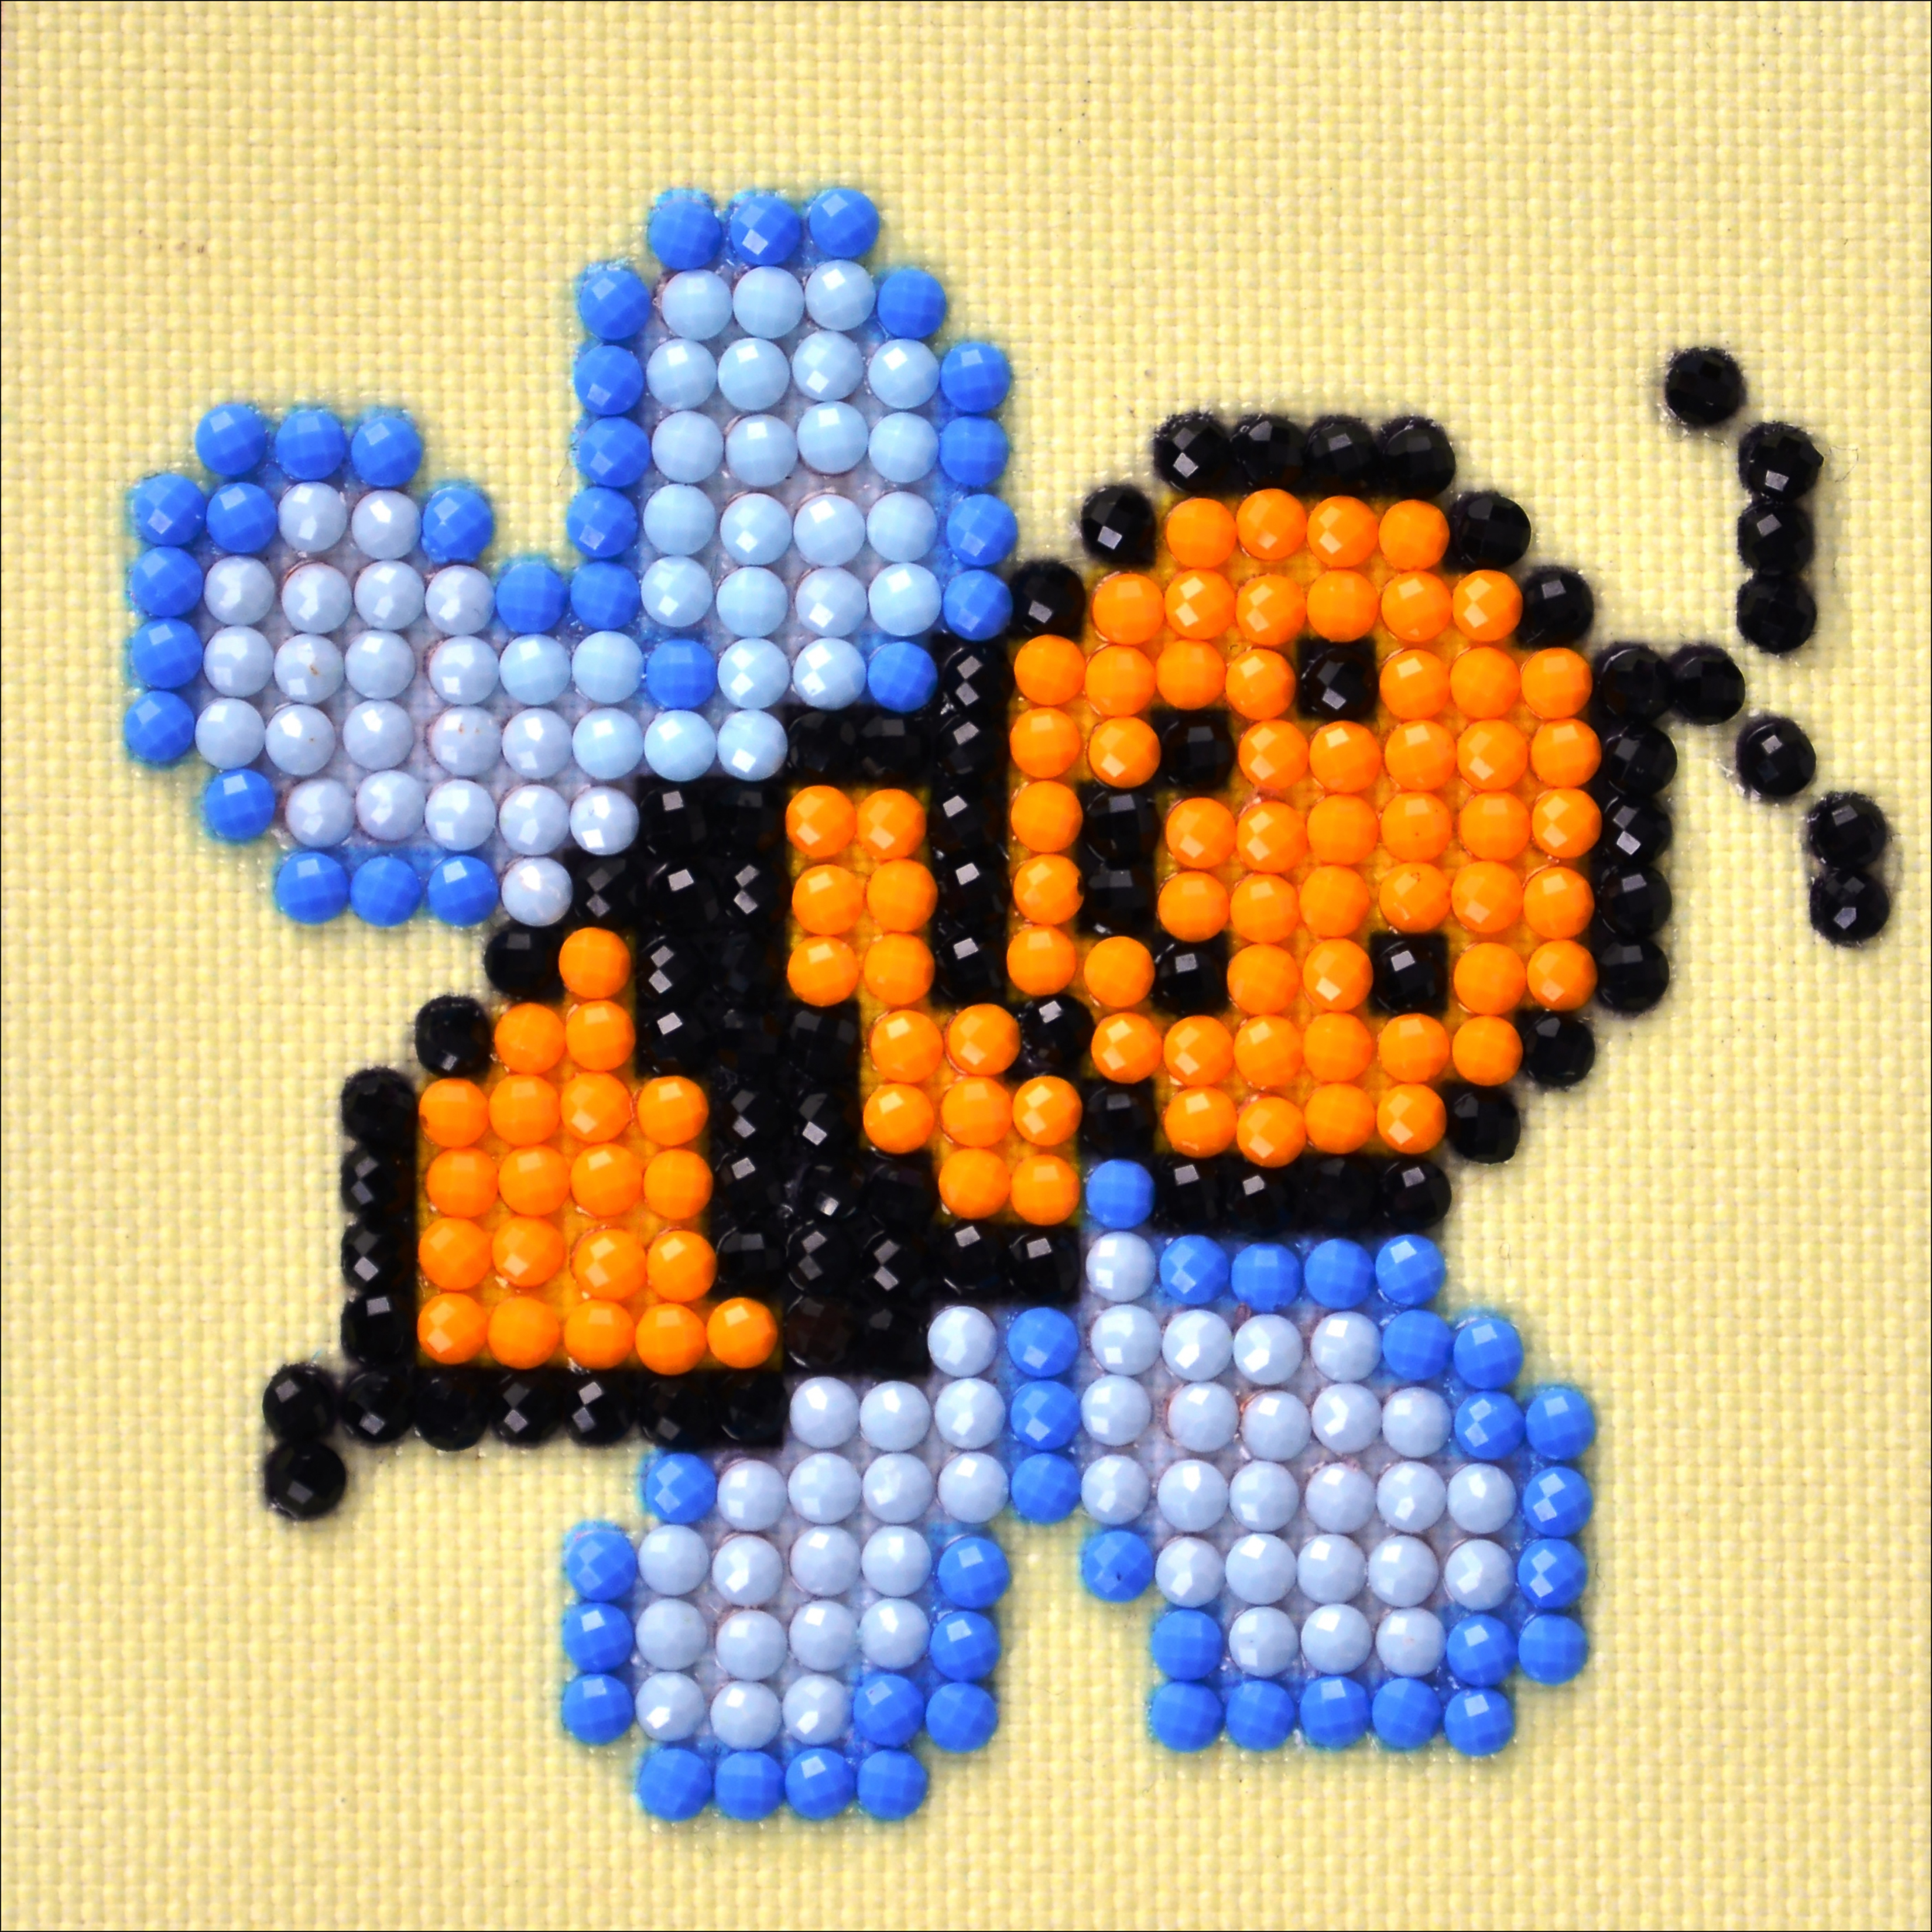 "Diamond Dotz Diamond Embroidery Facet Art Kit 4.75""X4.75""-Busy Buzzz"